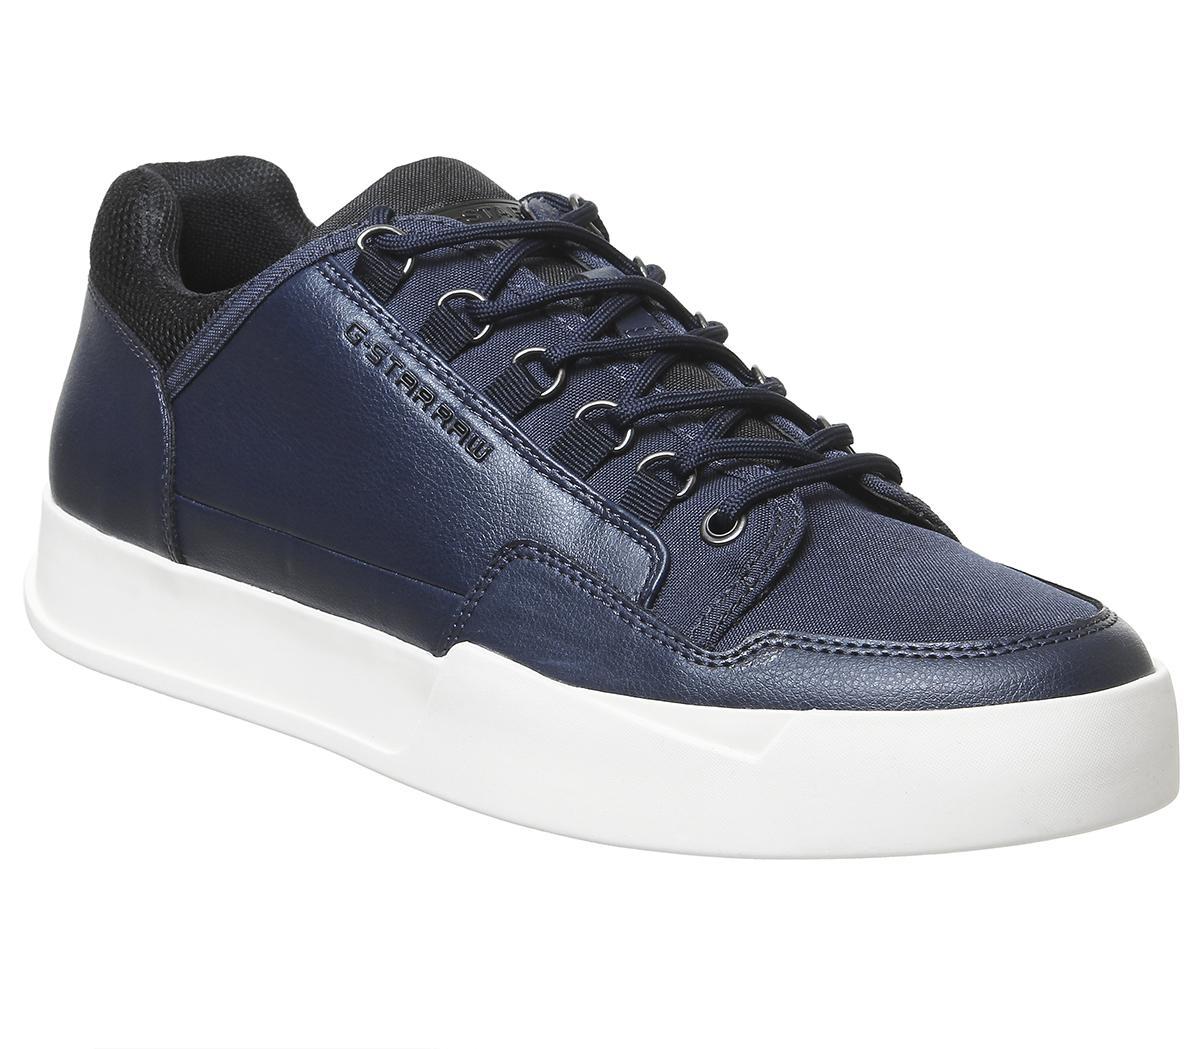 Rackham Vodan Low Sneakers